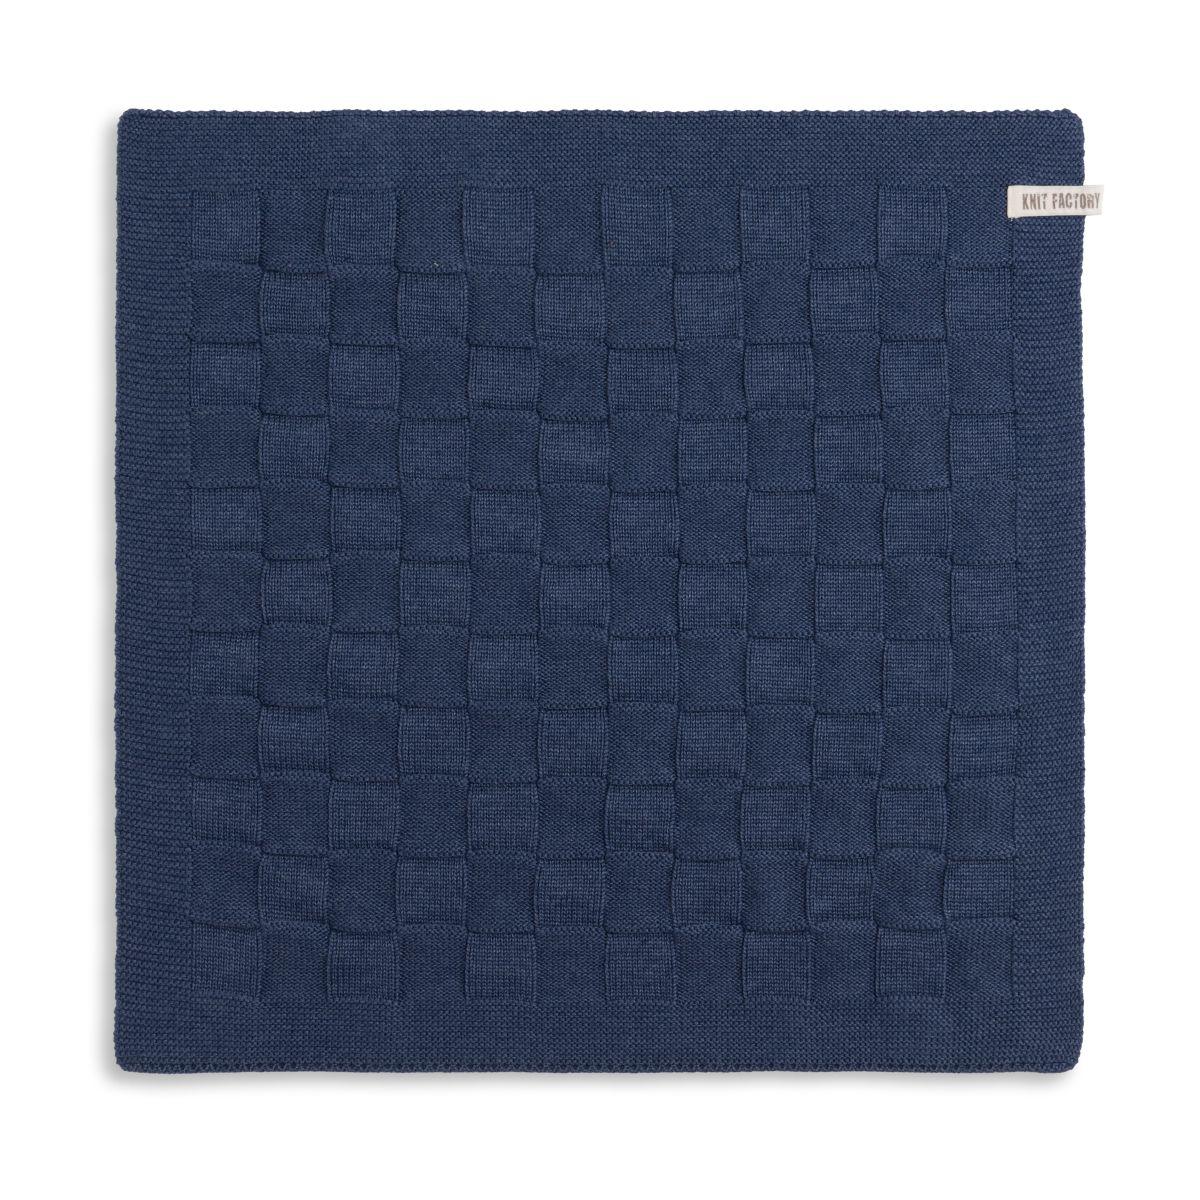 knit factory 2000013 keukendoek grote blok uni jeans